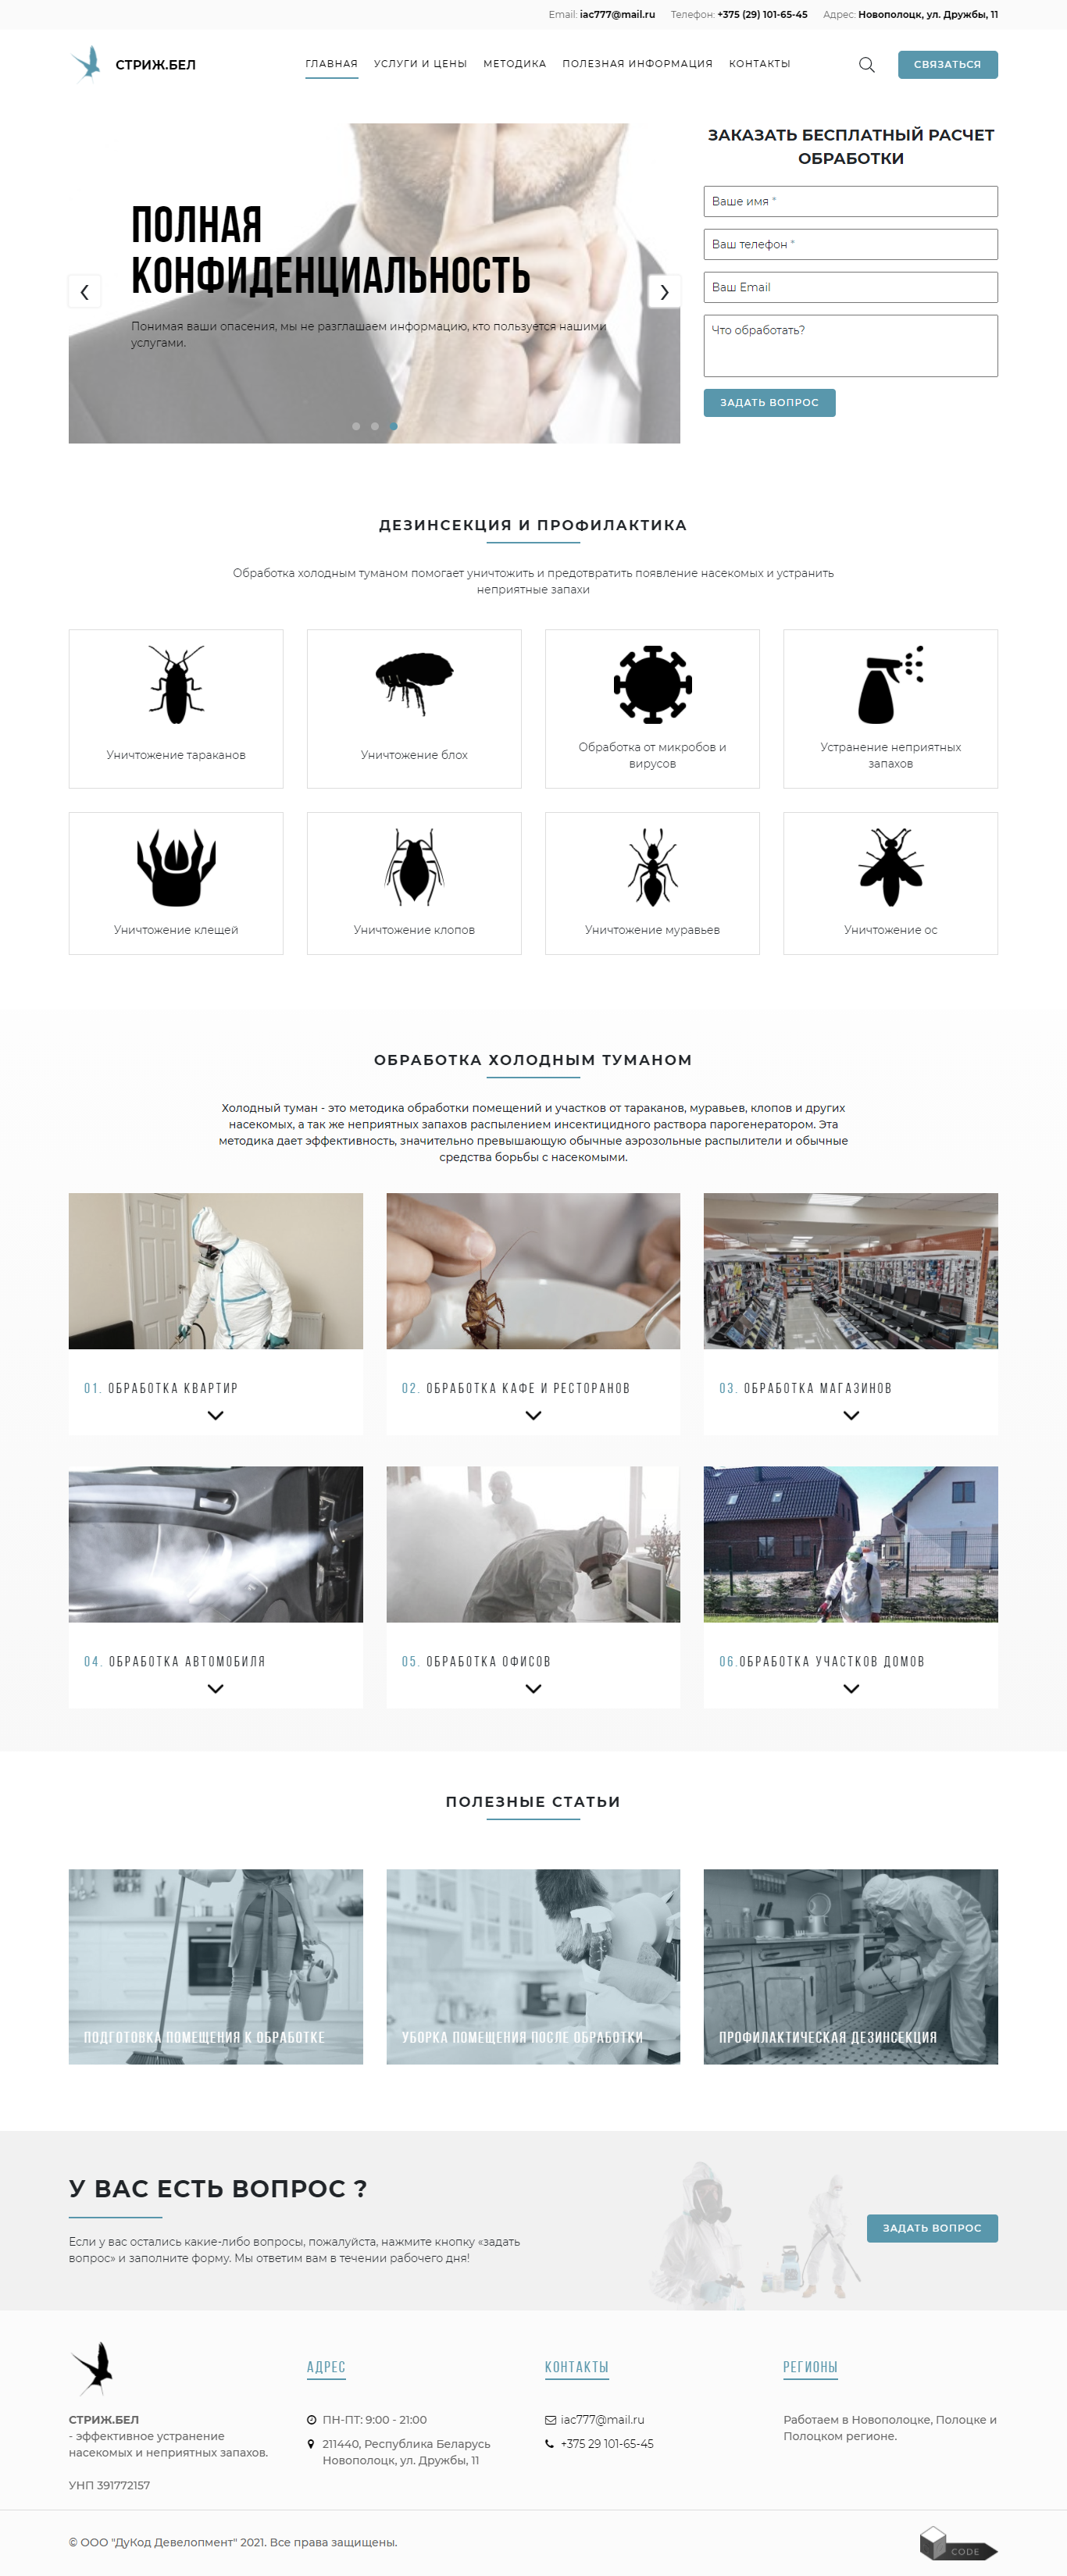 стриж.бел - корпоративный сайт услуг дезинсекции DoCode DEV